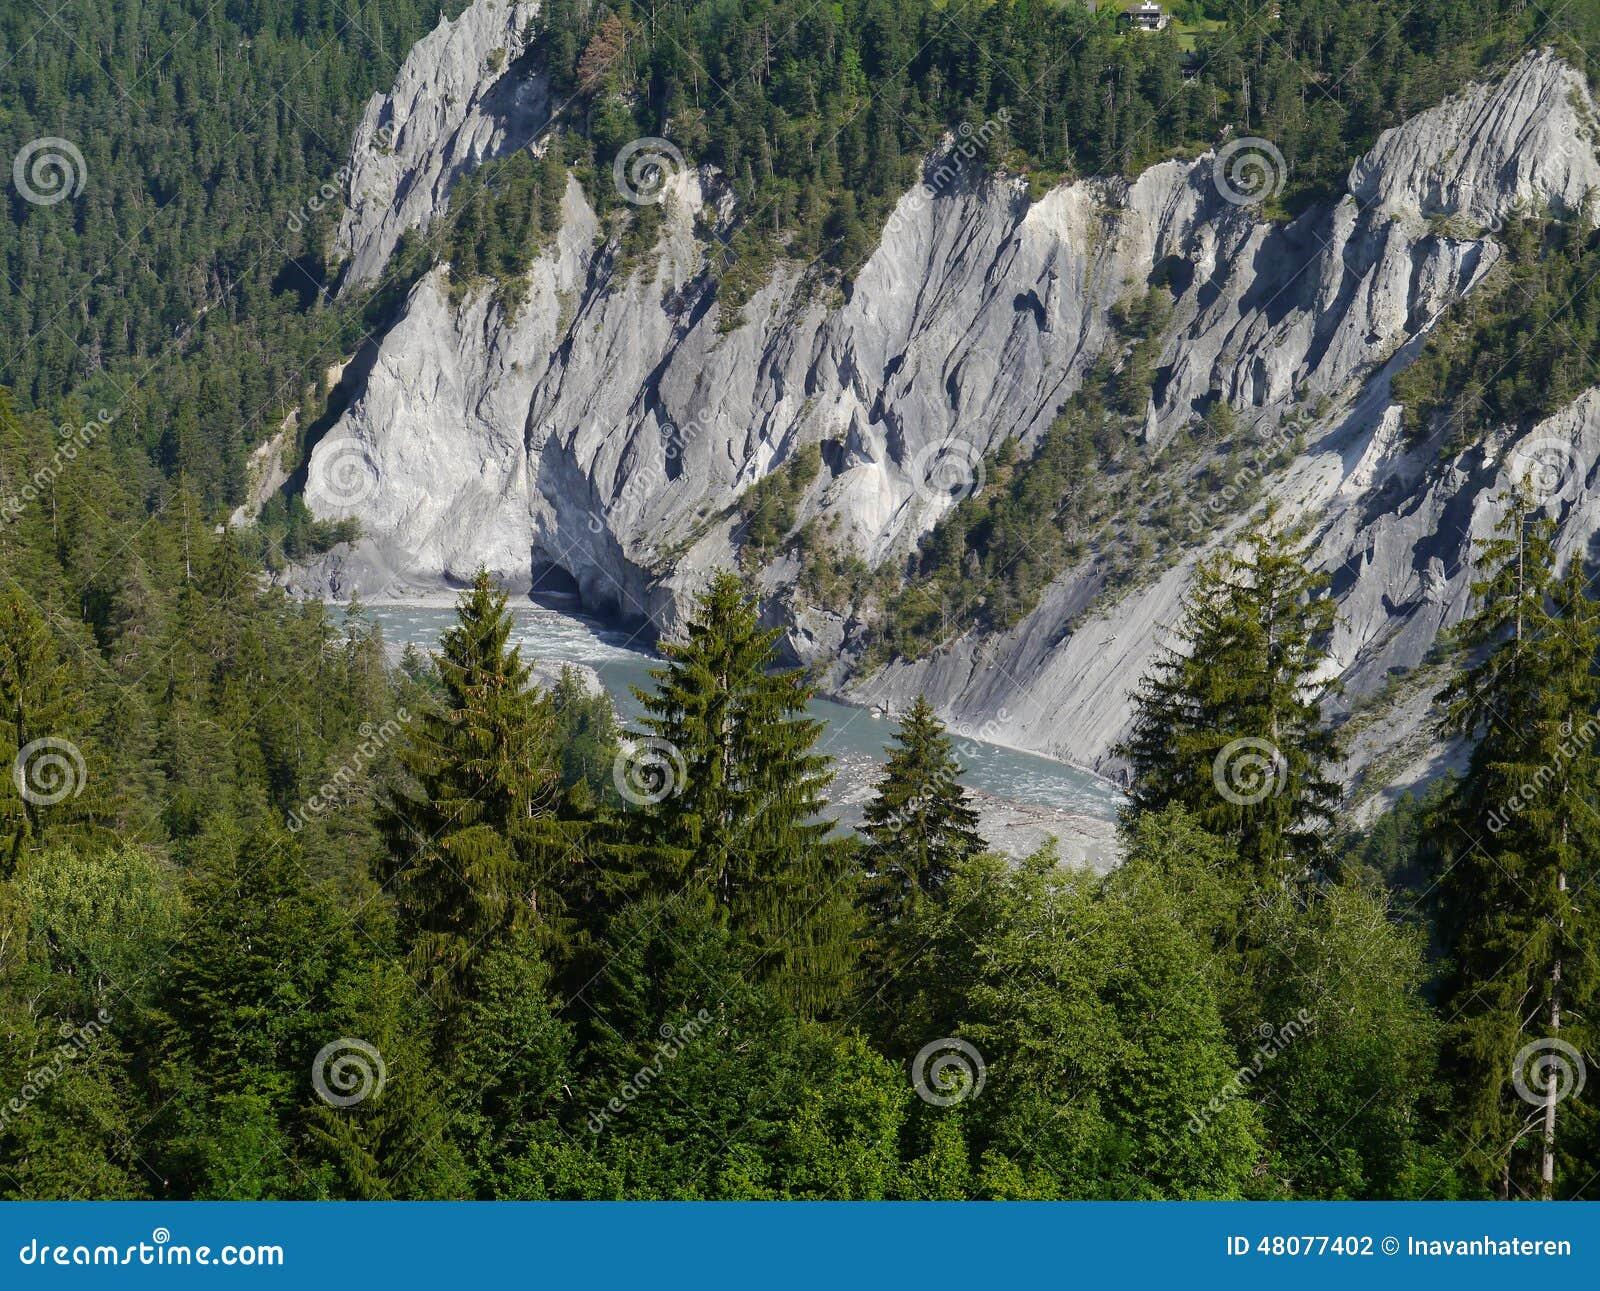 Ruinaulta or Rhine canyon or grand canyon